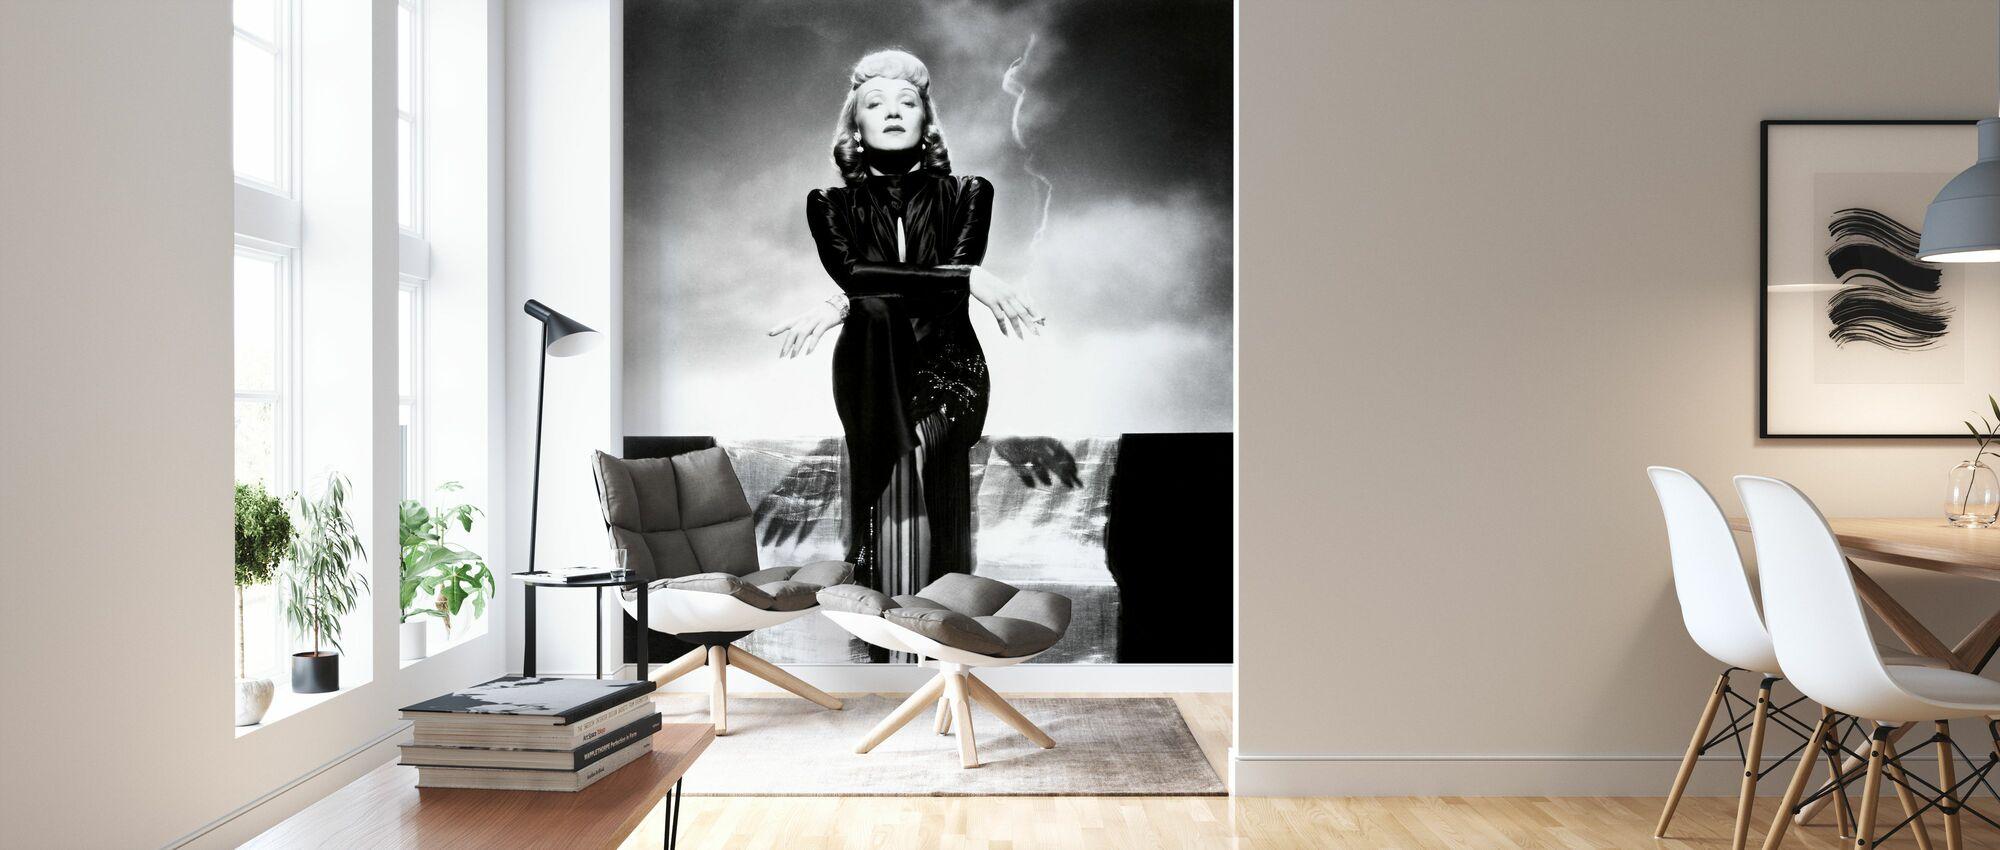 Manpower - Wallpaper - Living Room